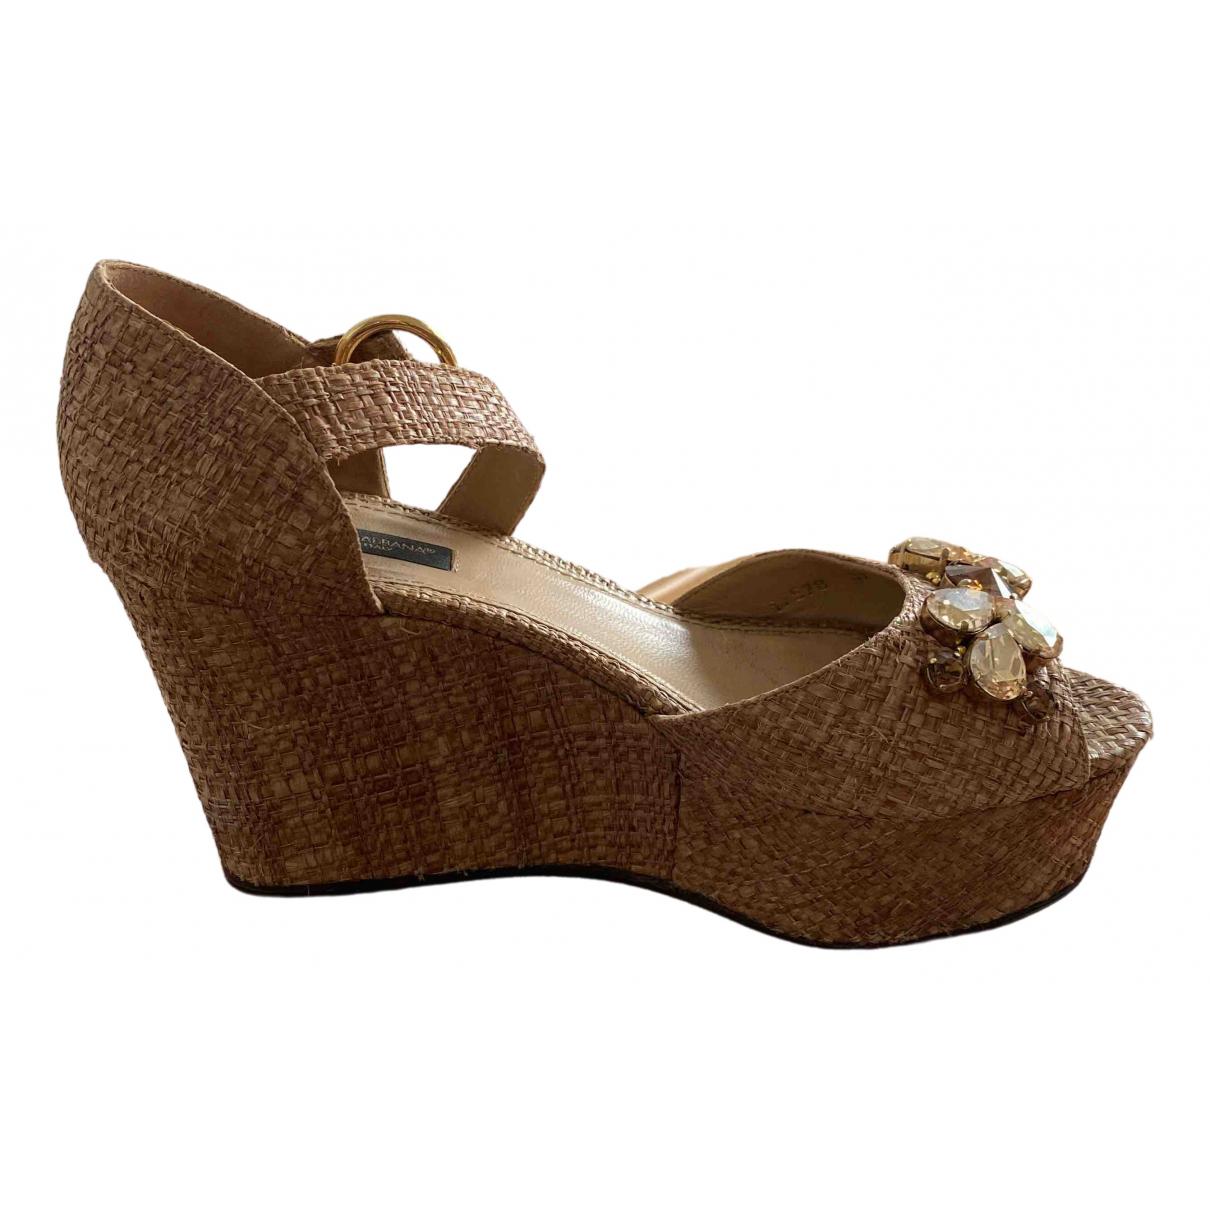 Dolce & Gabbana \N Beige Suede Heels for Women 37 EU